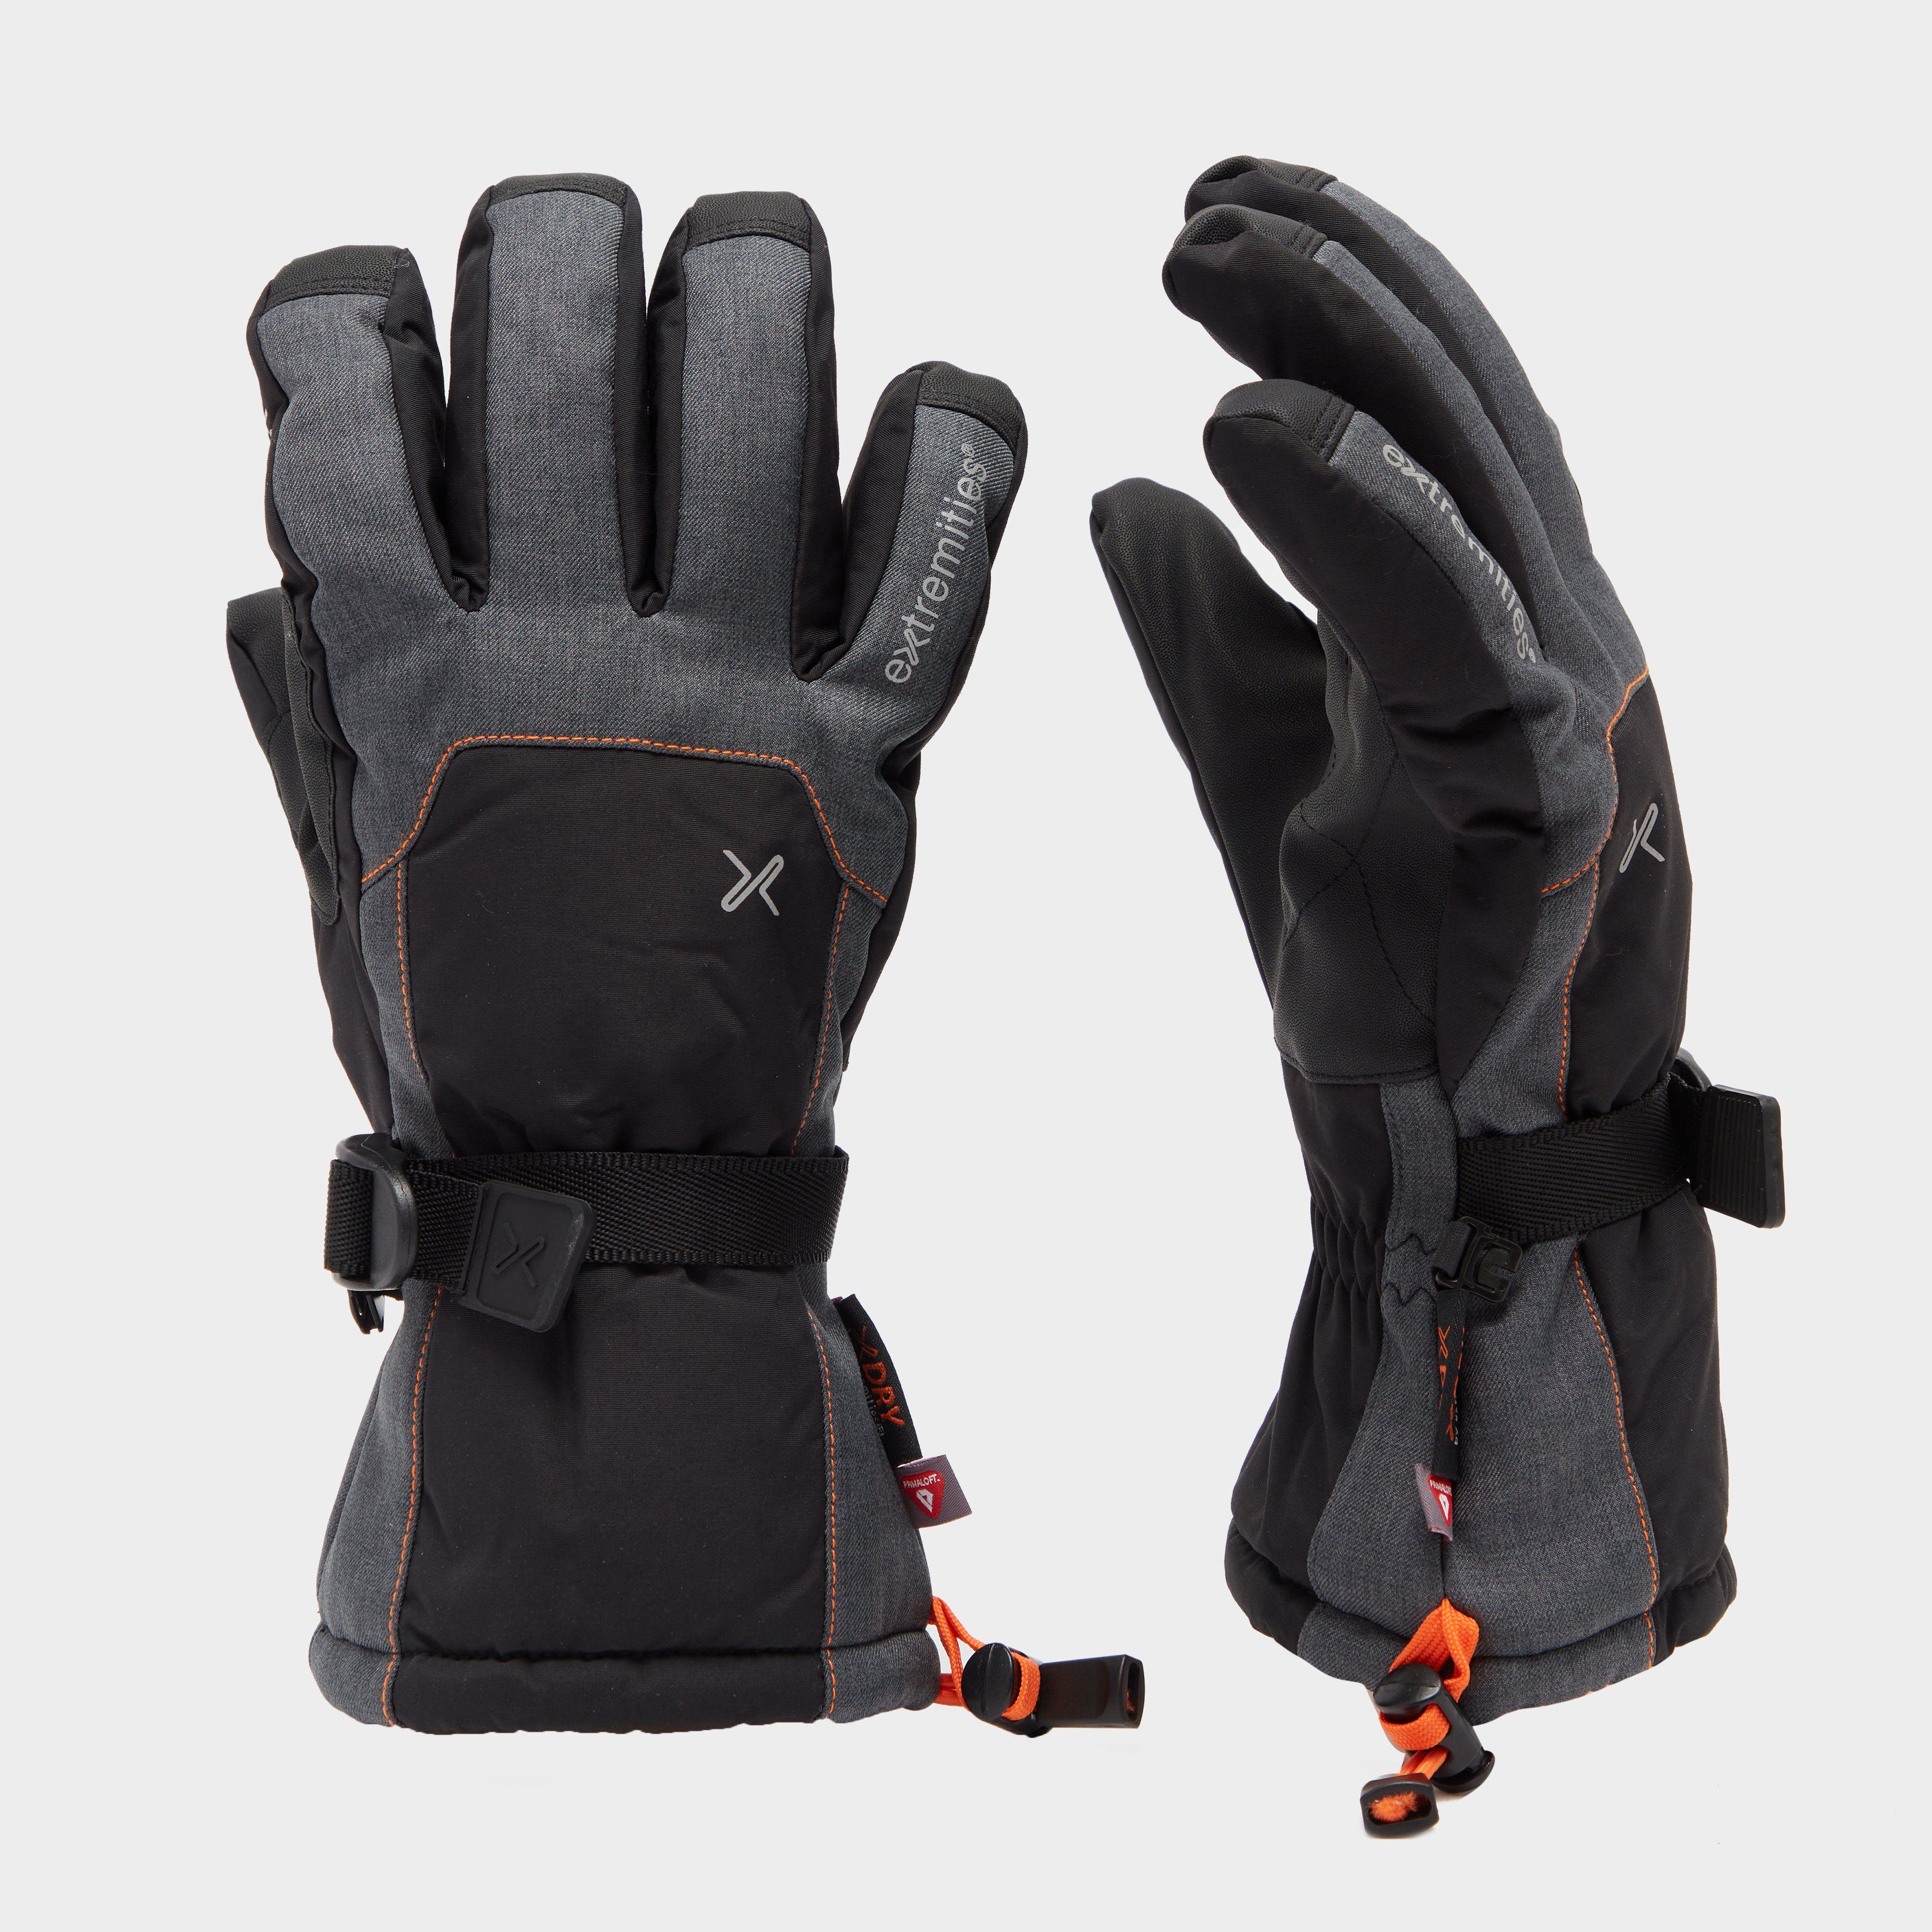 EXTREMITIES Men's Torres Peak Ski Gloves